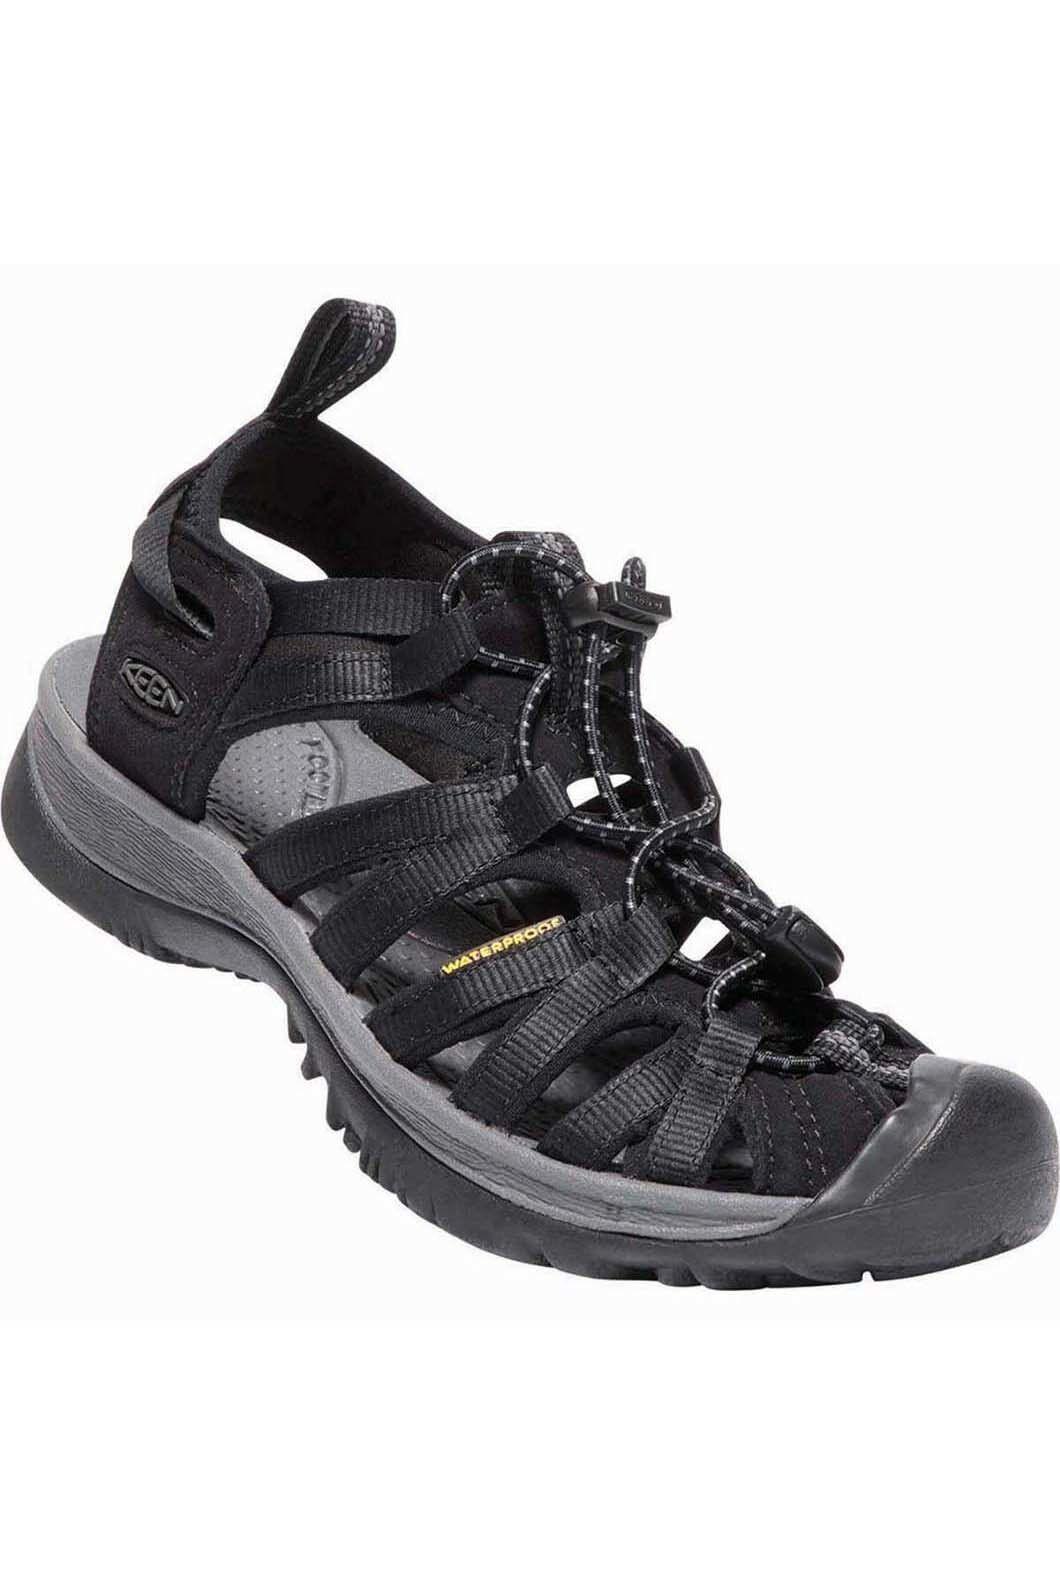 Keen Women's Whisper Sandals U, Black/Magnet, hi-res